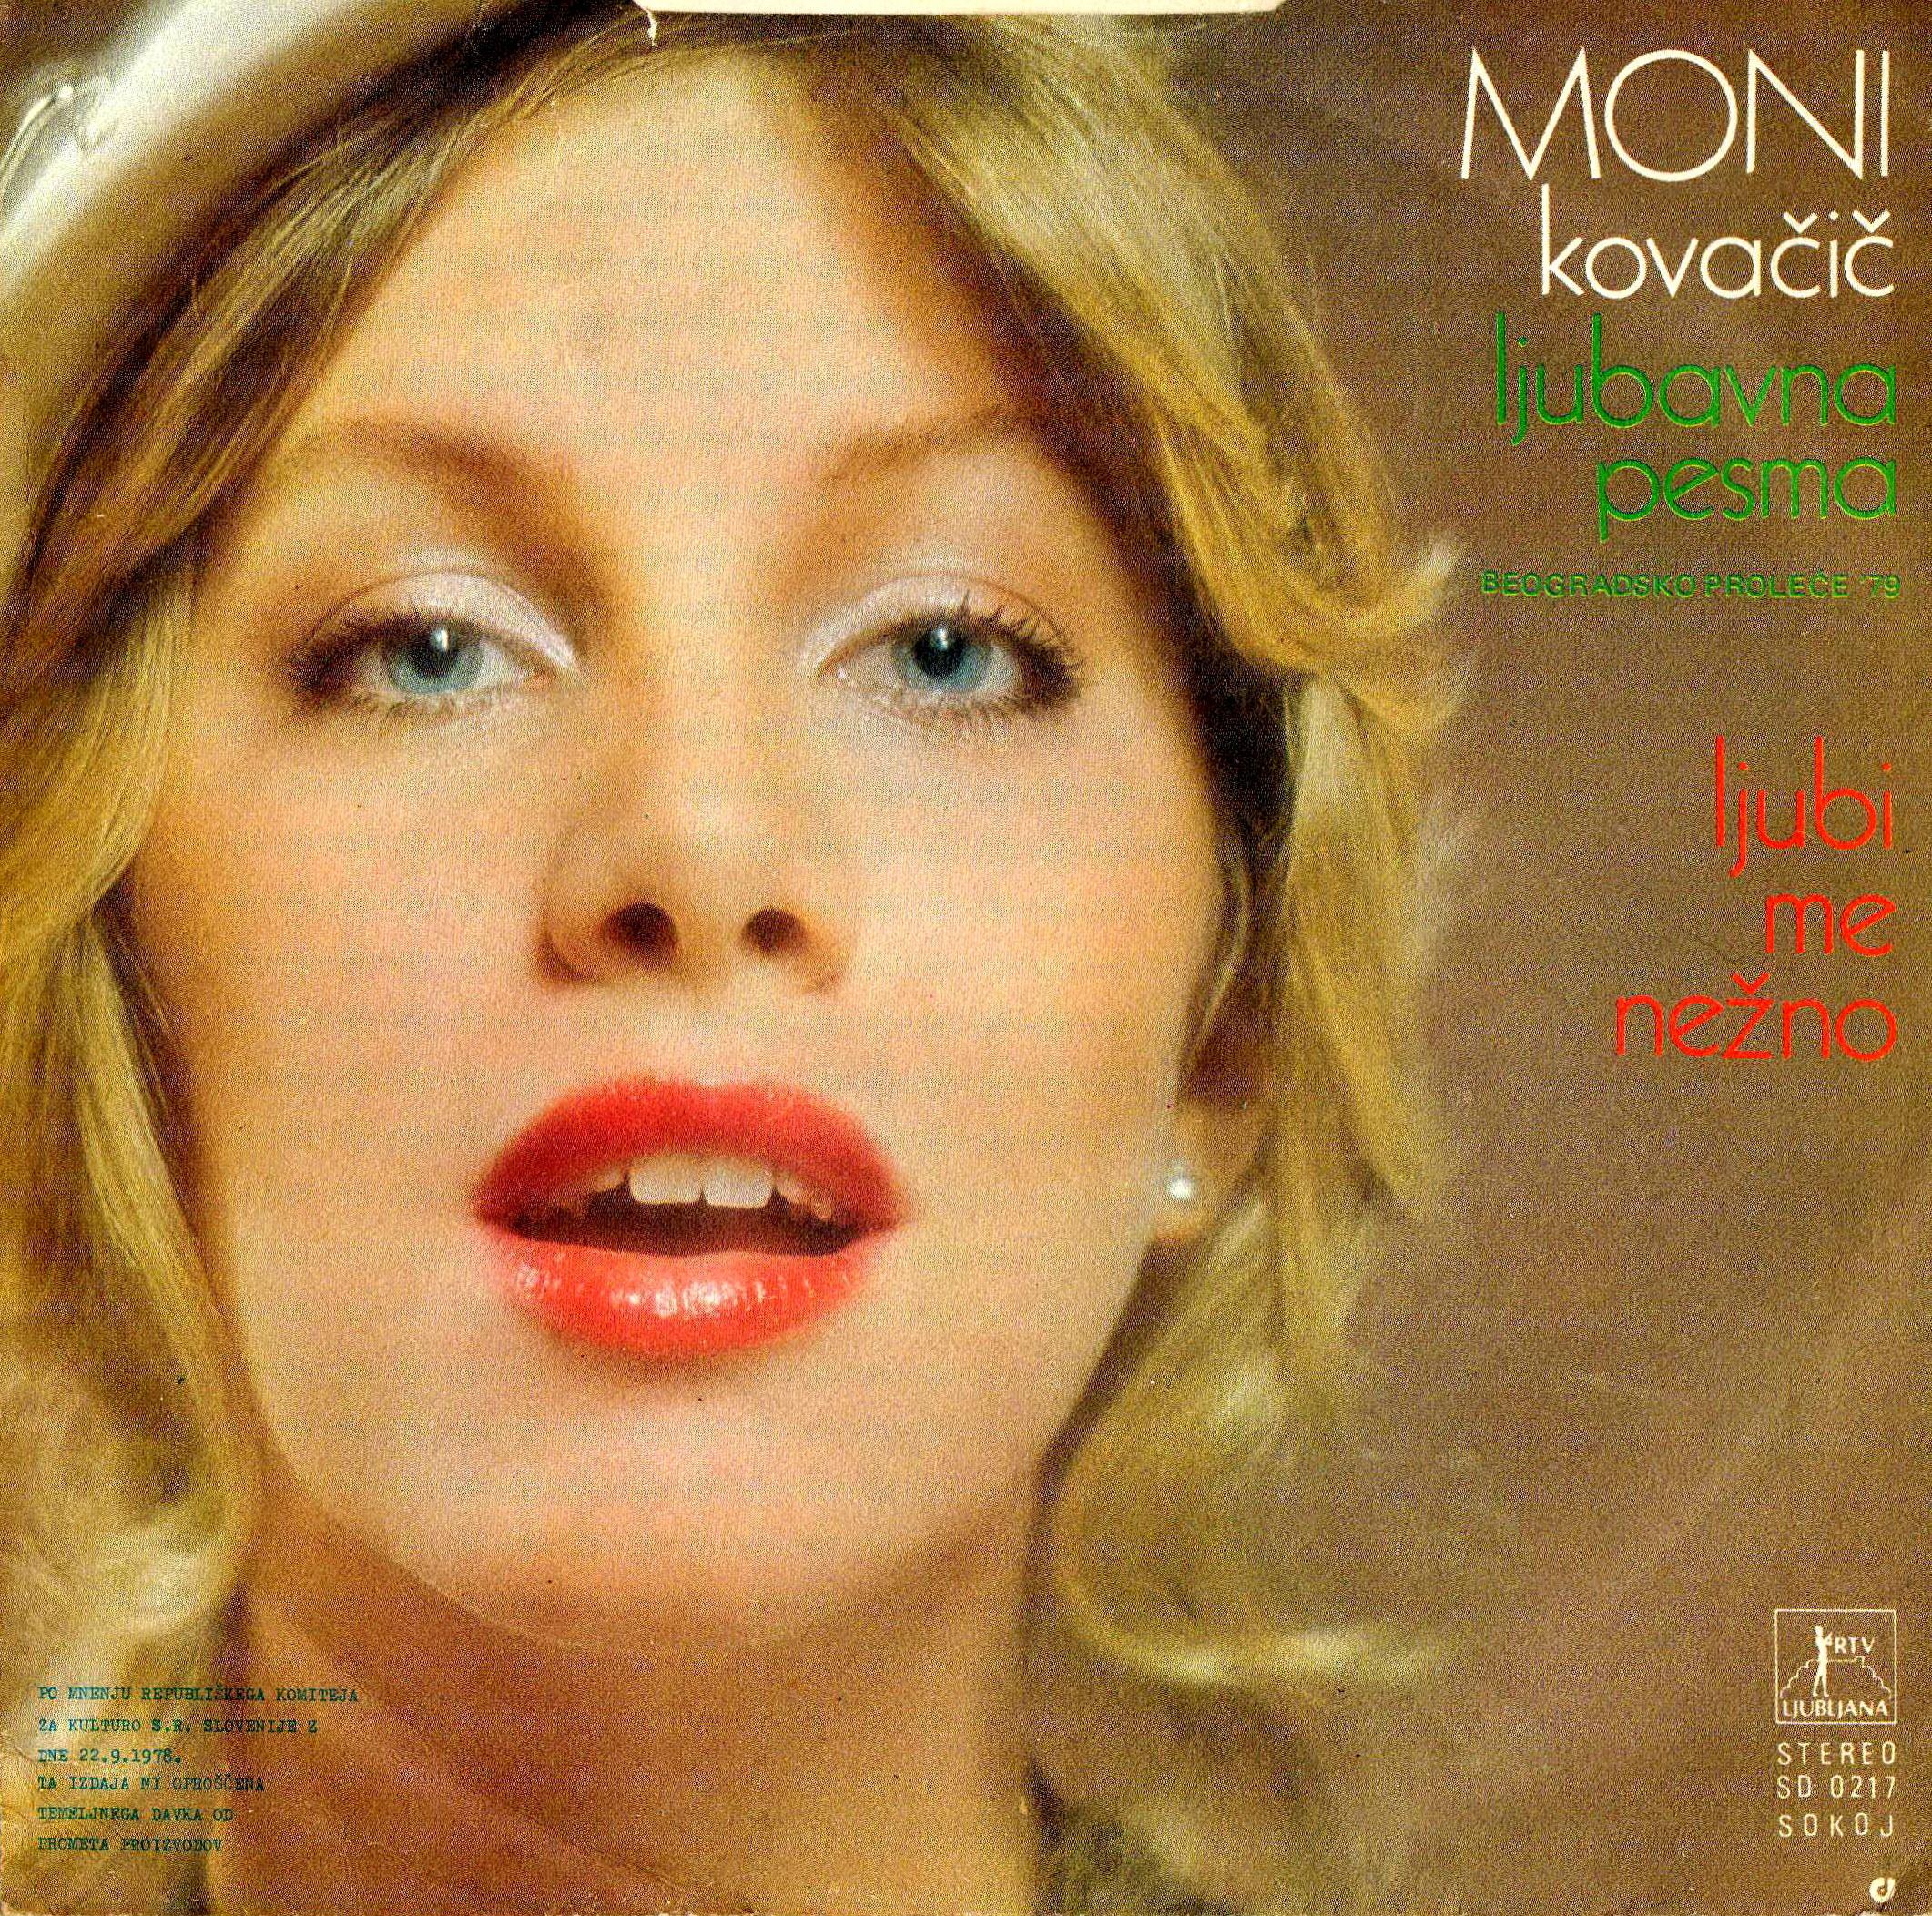 Moni Kovacic 1979 b